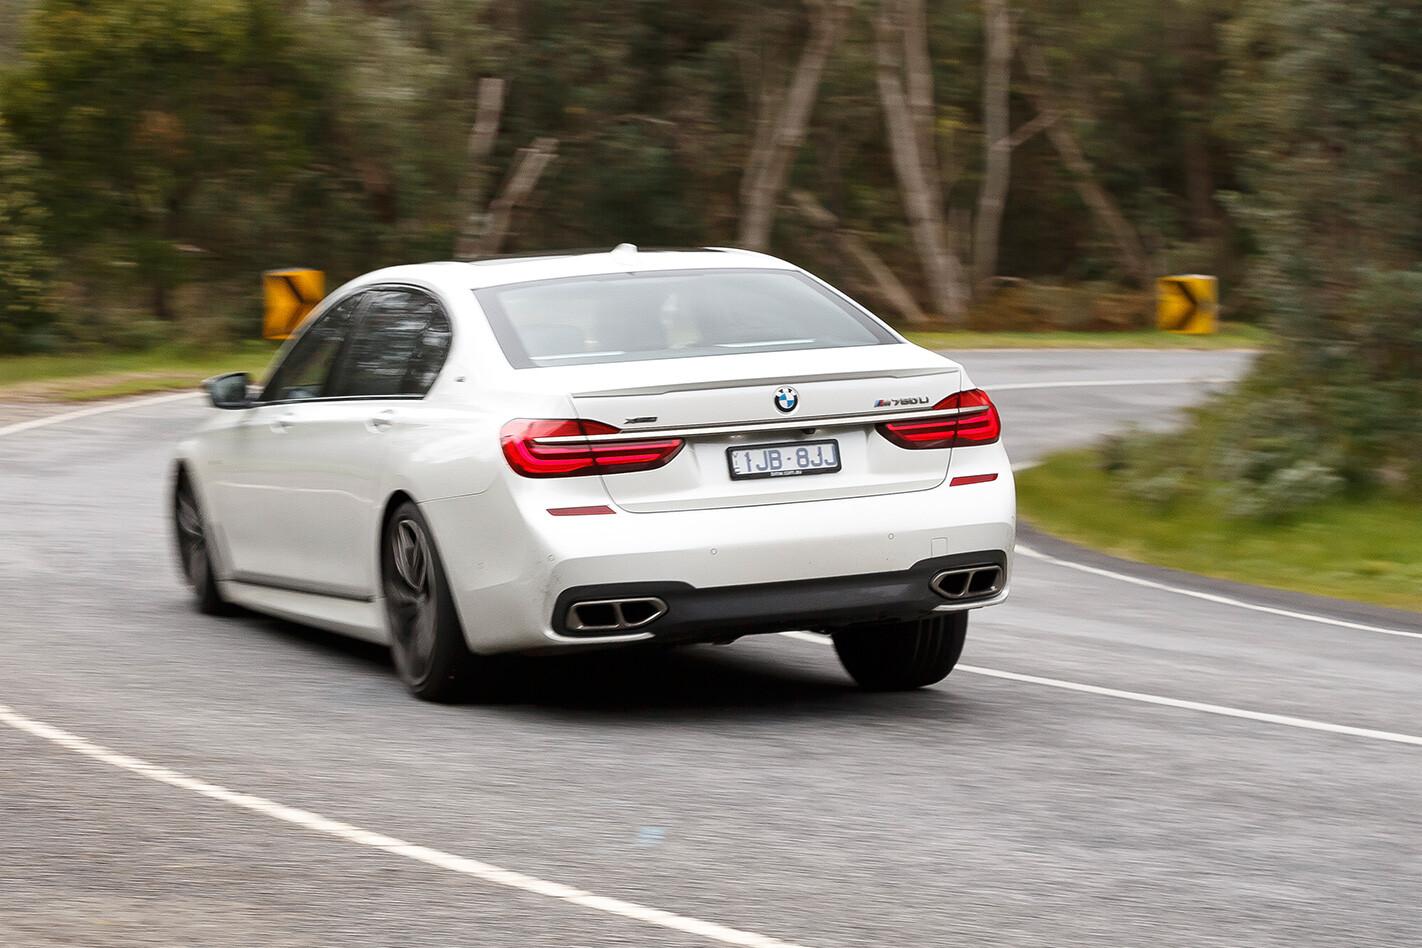 2017-BMW-M760Li-xDrive-rear.jpg